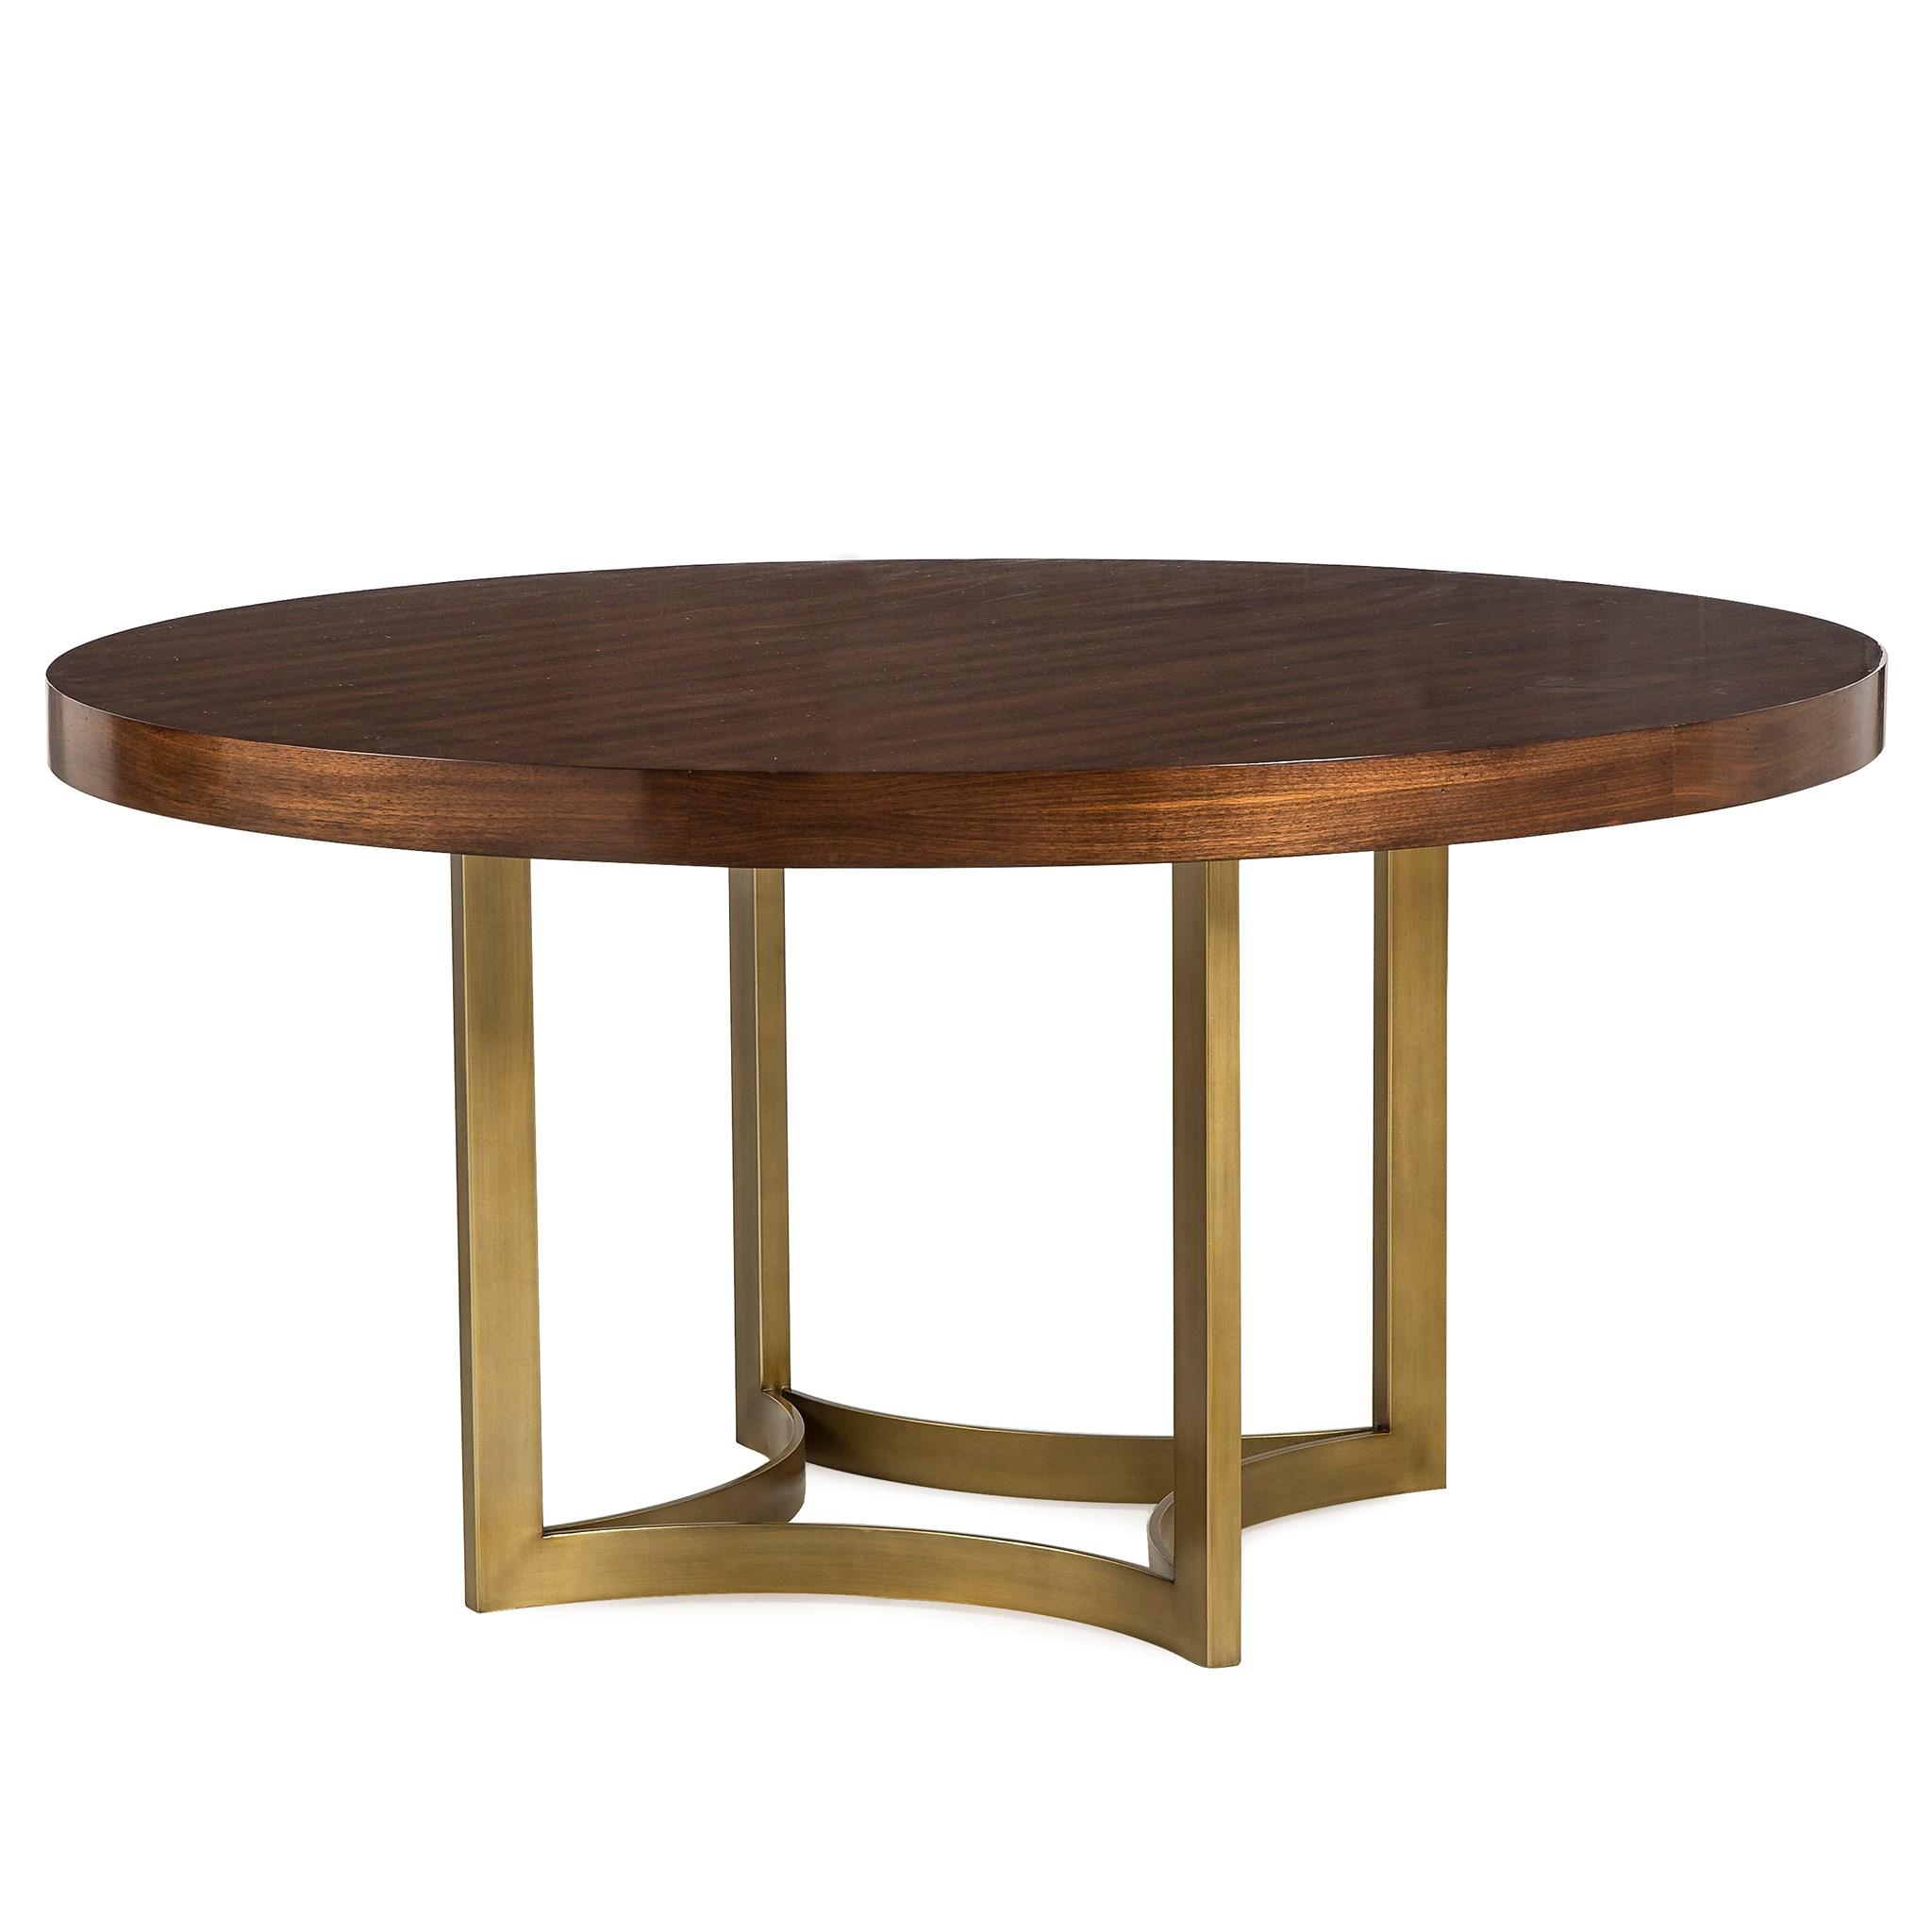 Ashton Dining Table - Large / Round